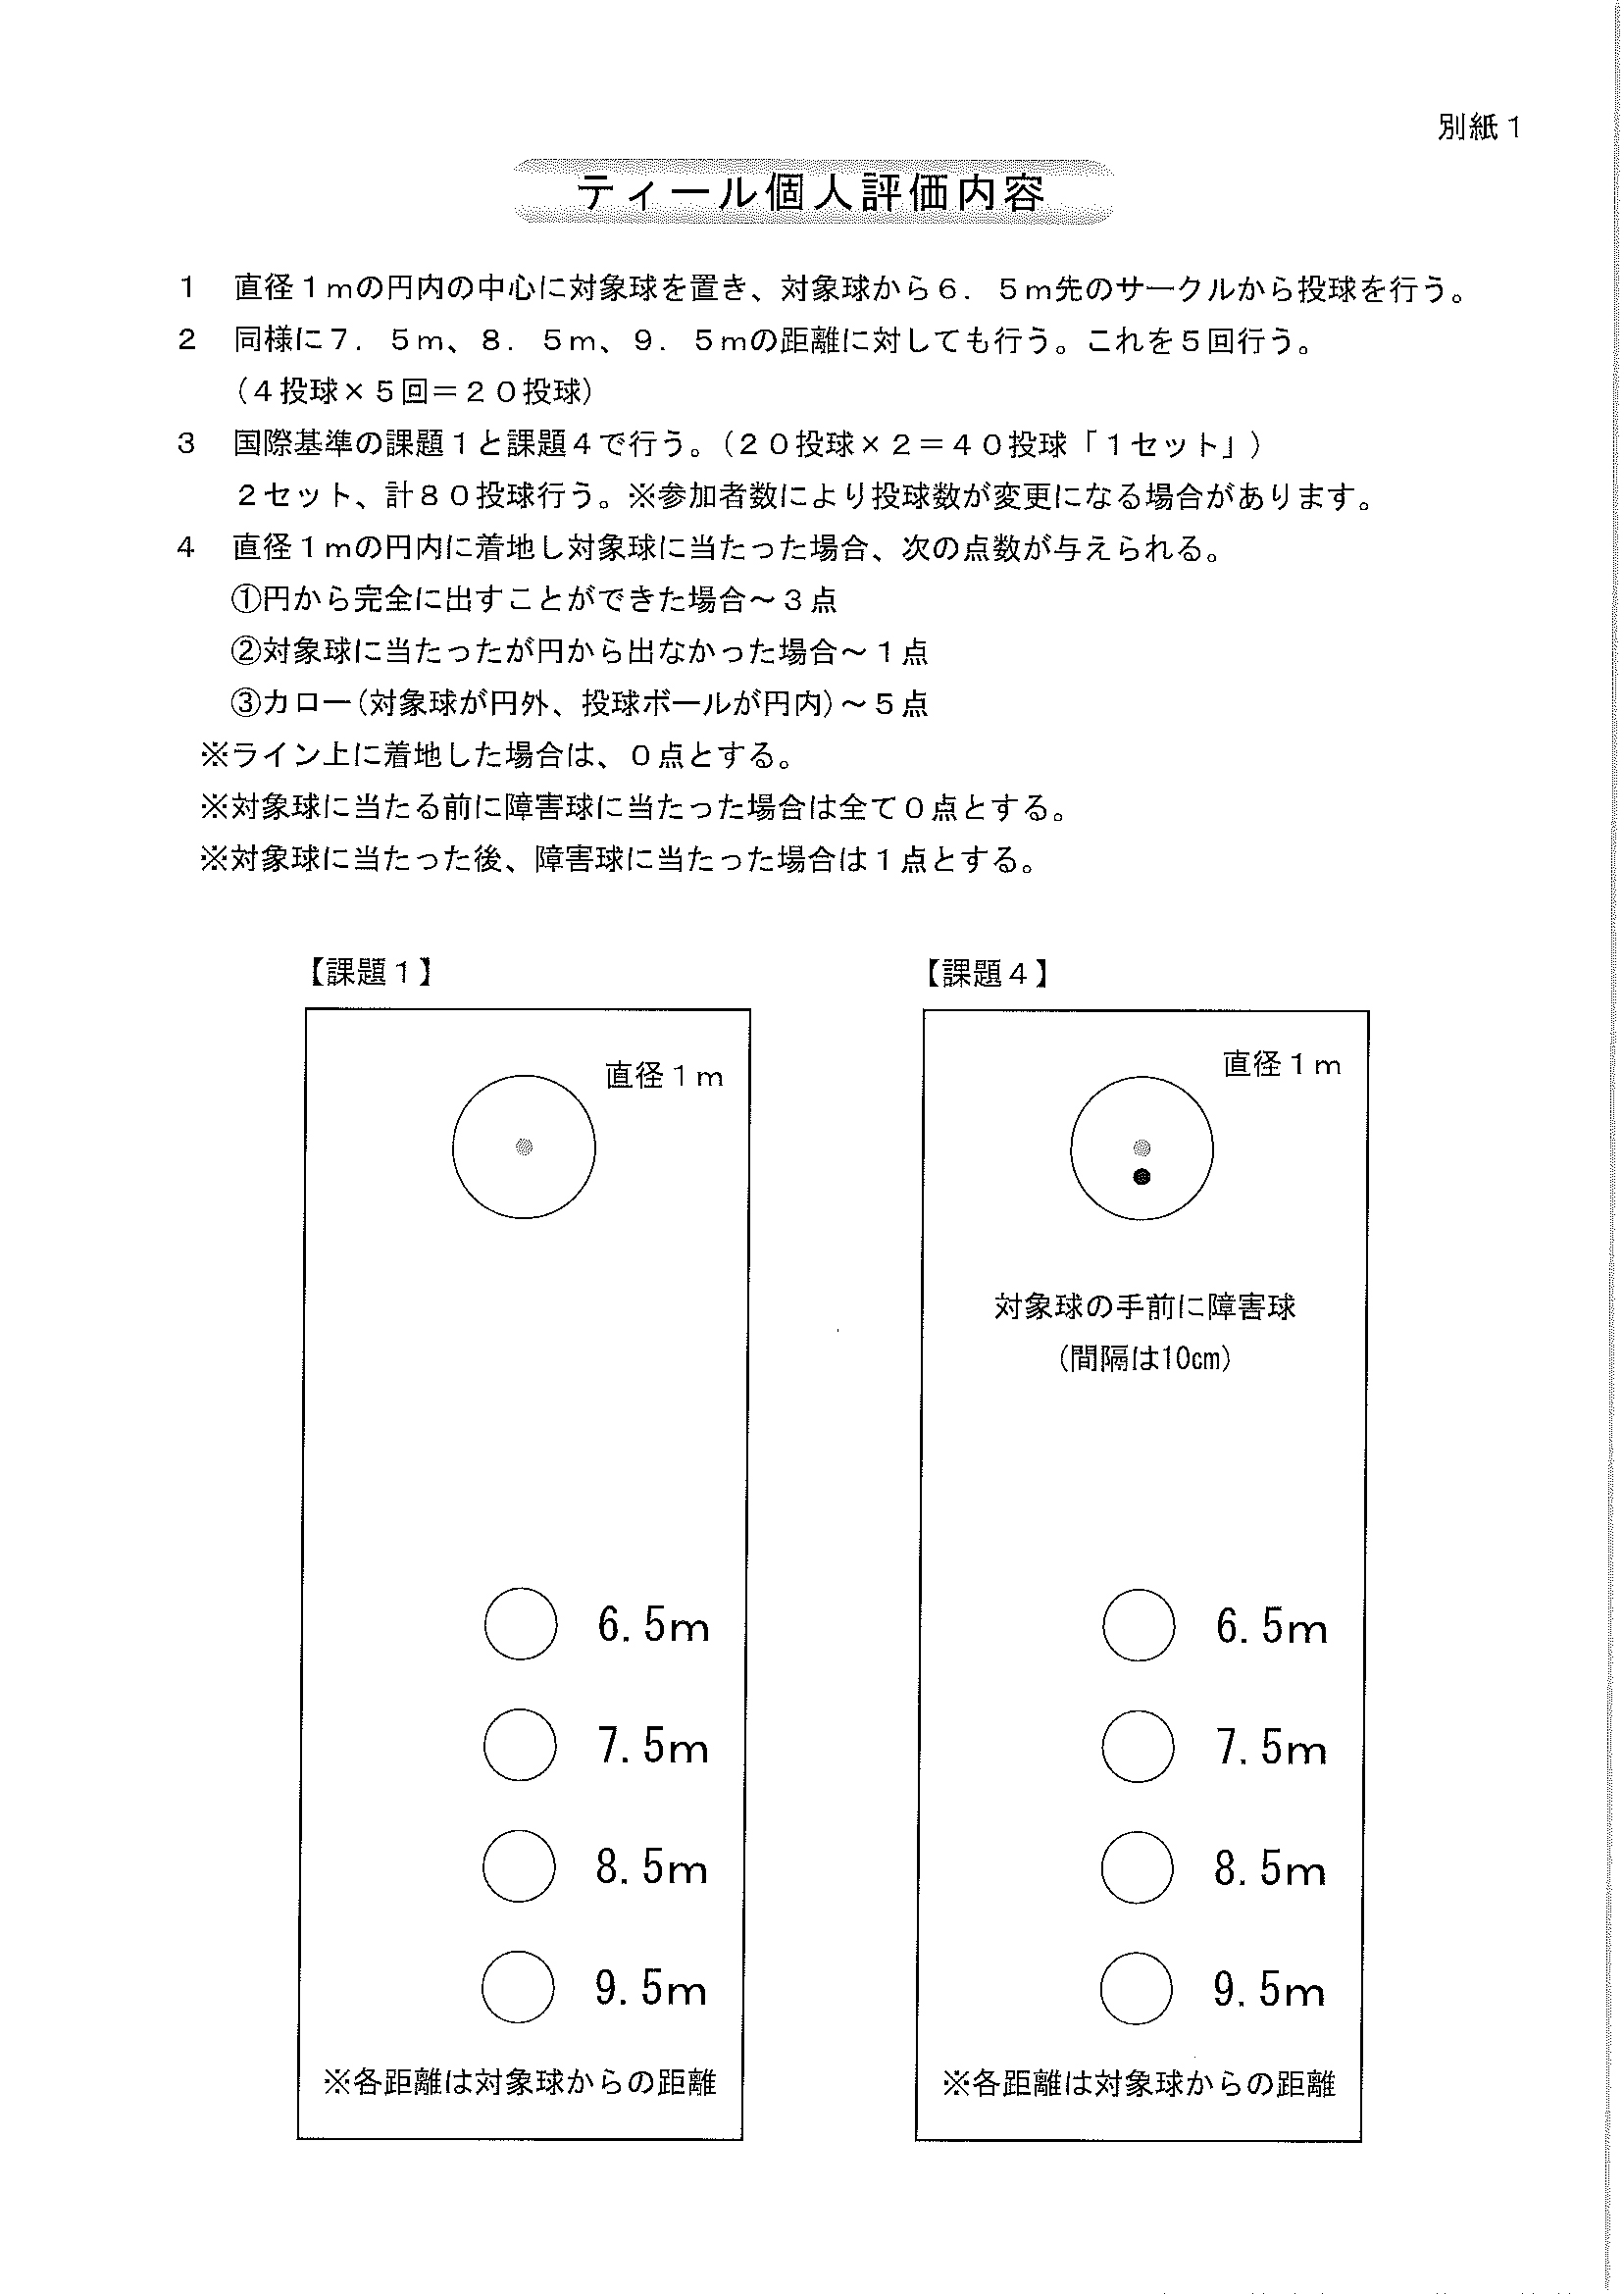 1senkoukai2.jpg